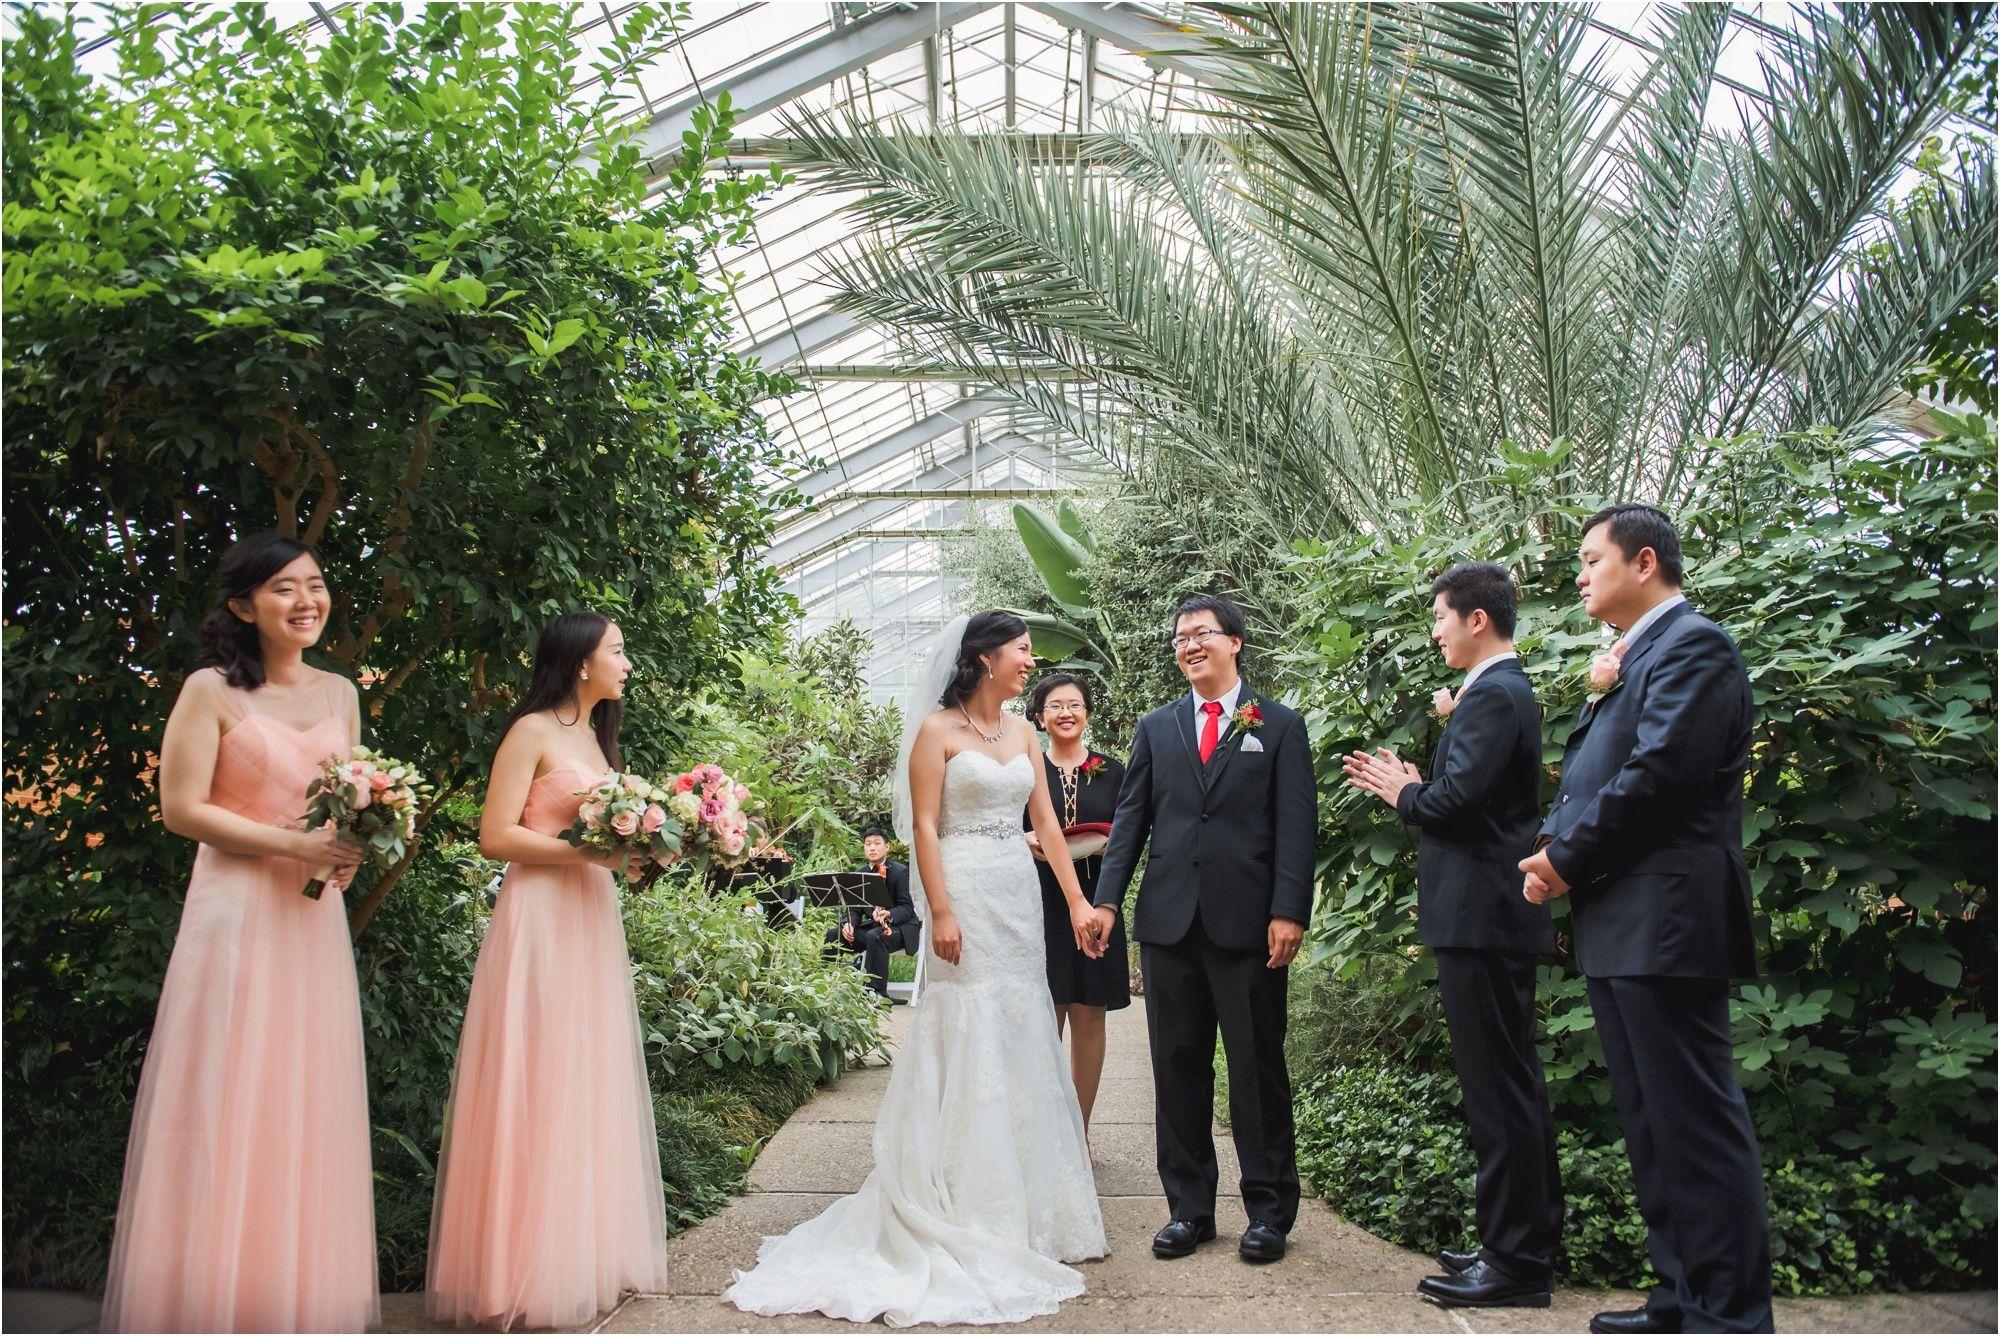 E Schmidt Photography Wedding, Lifestyle, Newborn